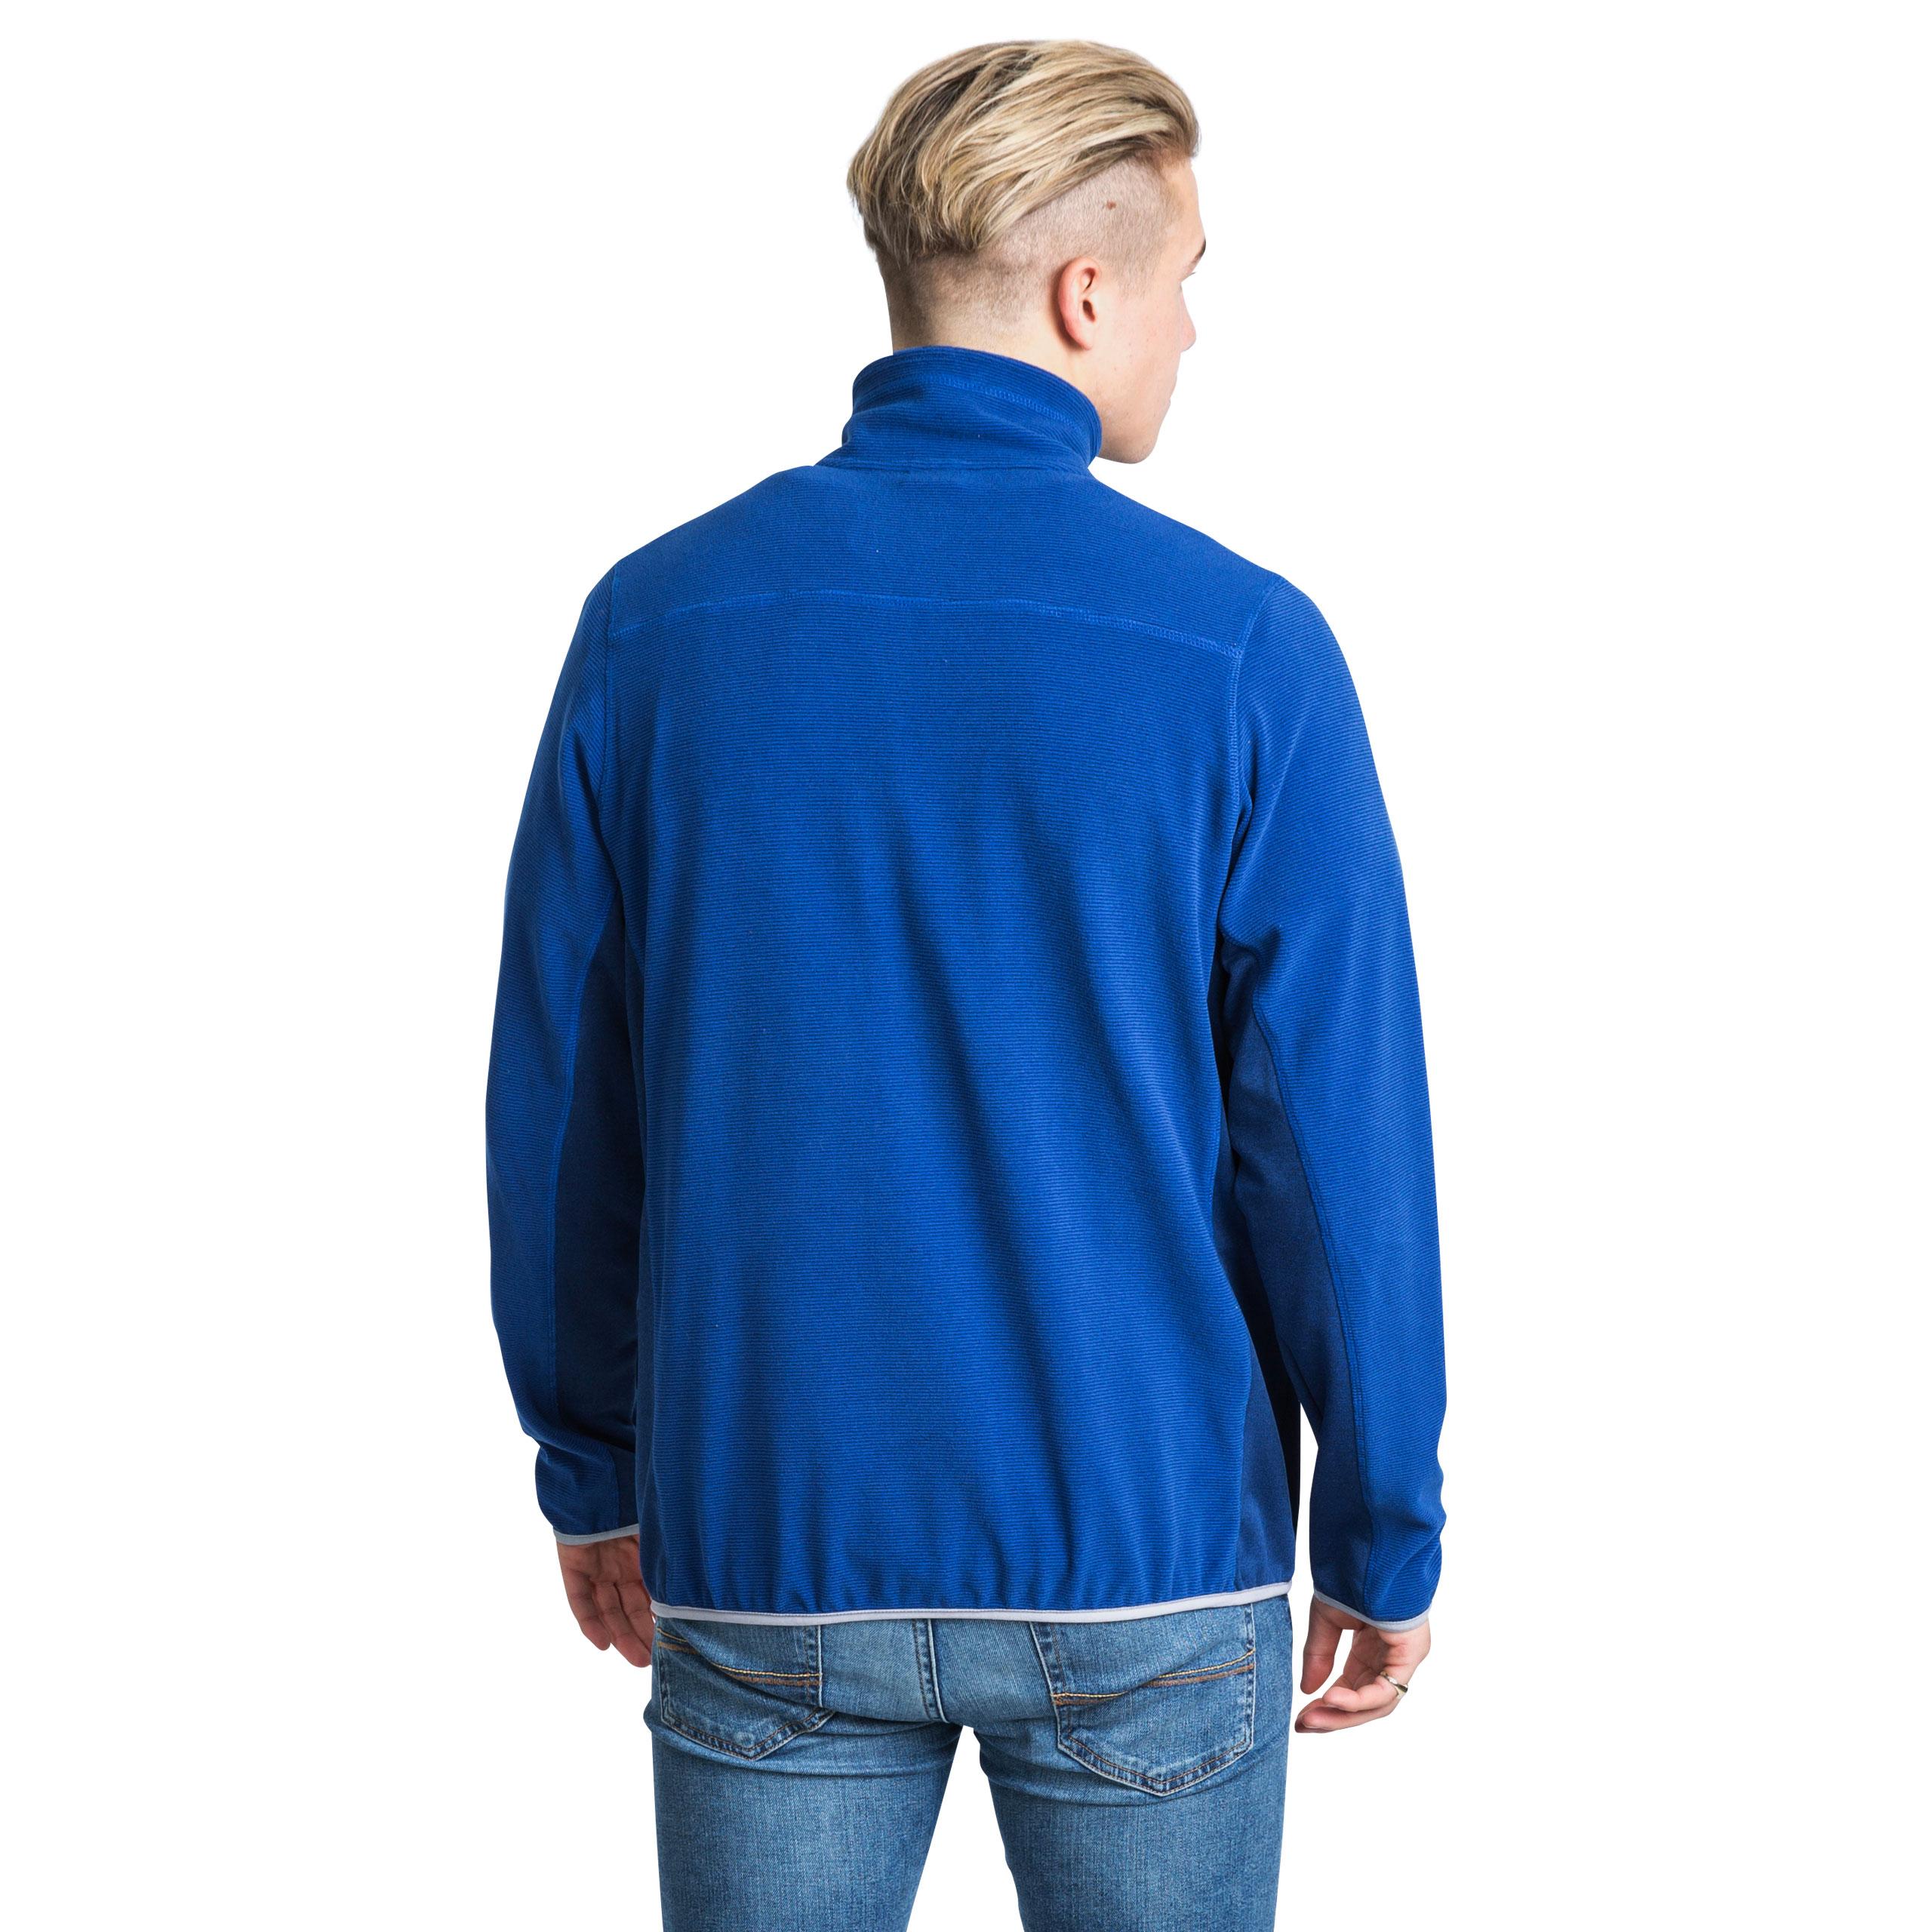 Trespass-Mirth-Mens-Textured-Fleece-Jacket-Full-Front-Hiking-Jumper-with-Pockets thumbnail 16